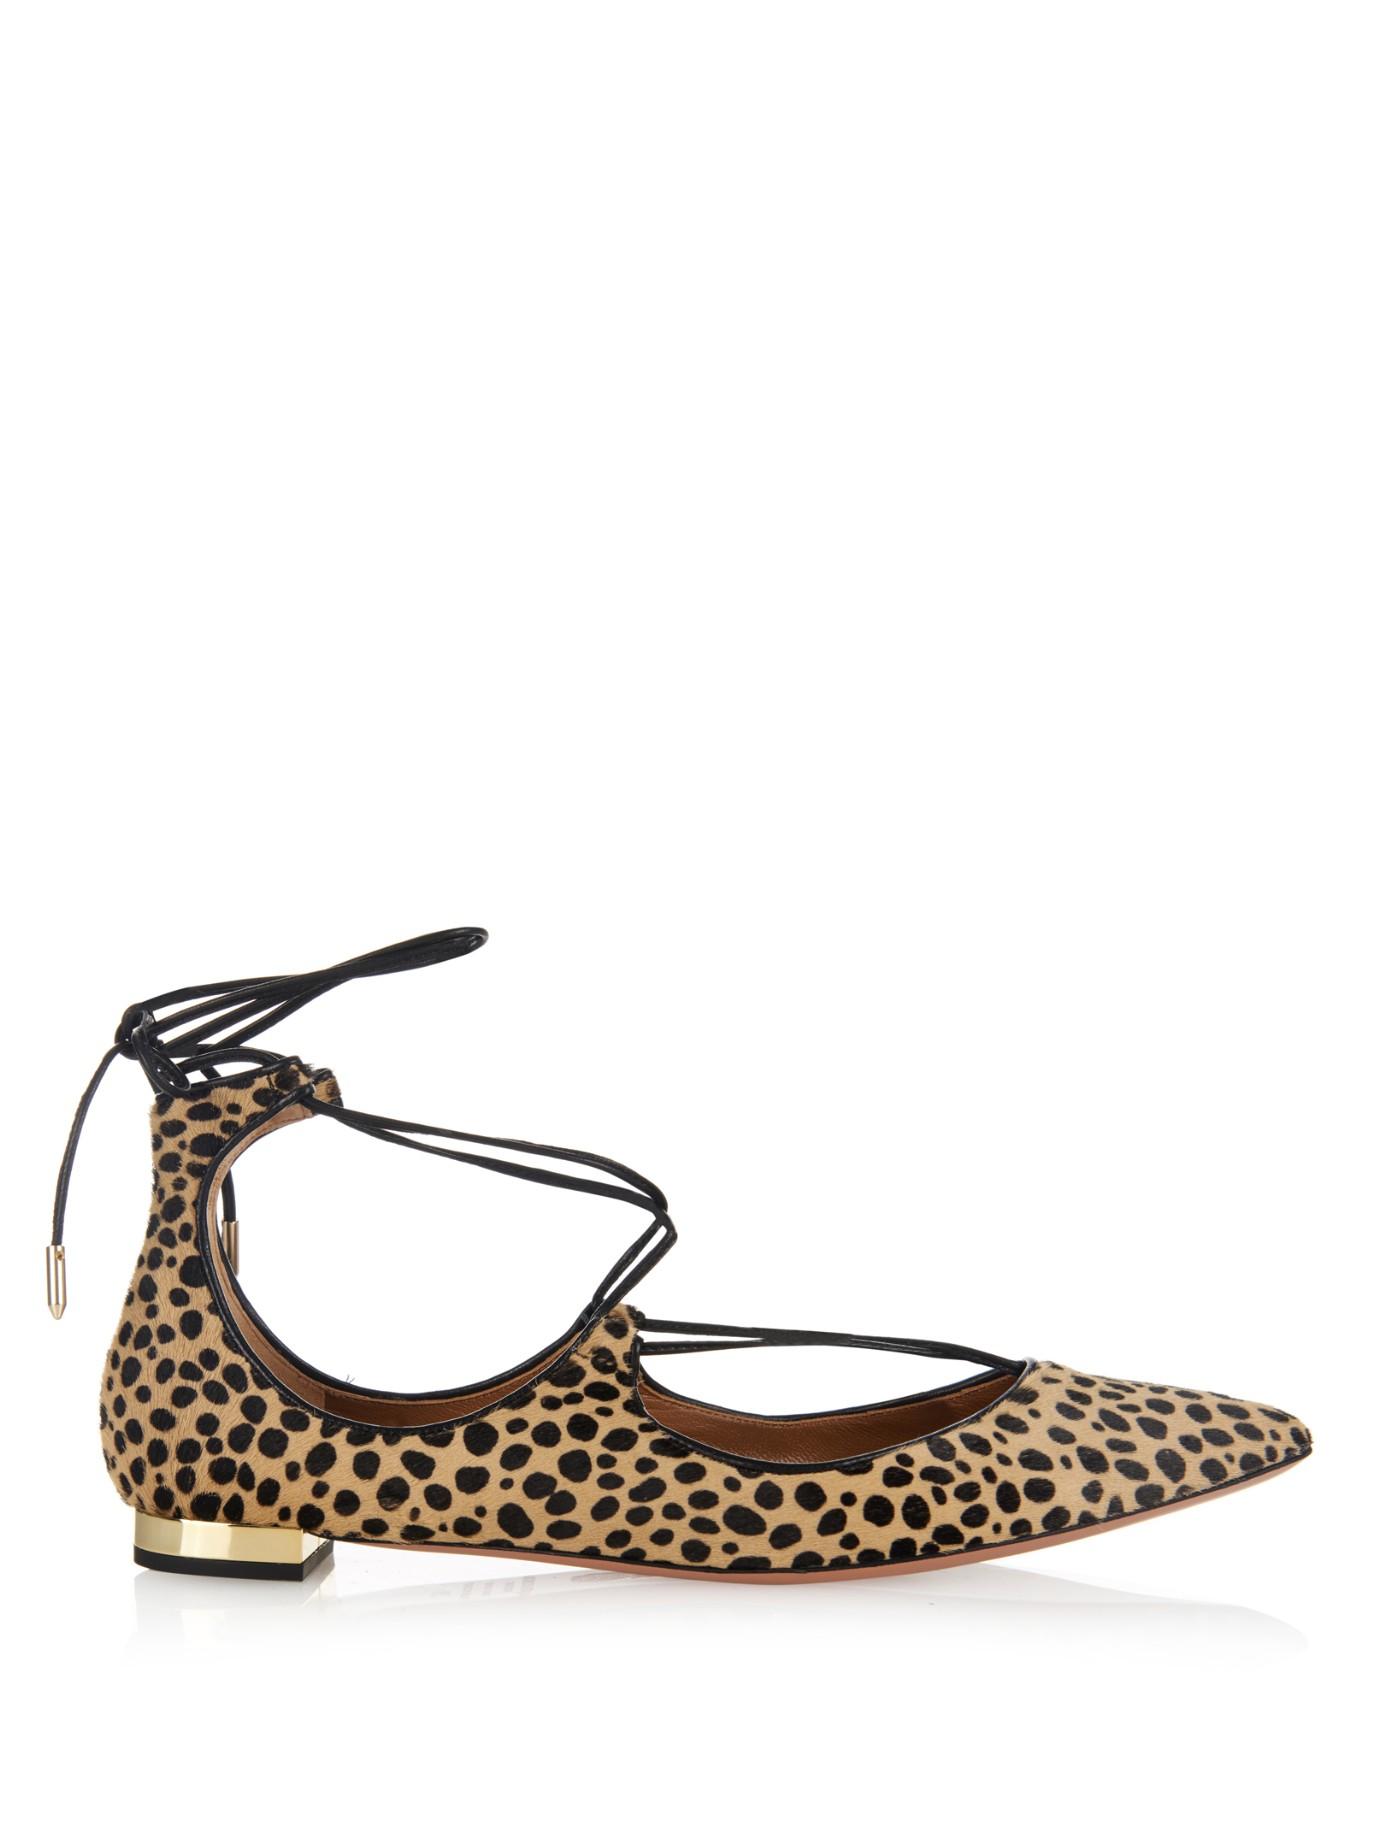 Animal Print Shoe Laces